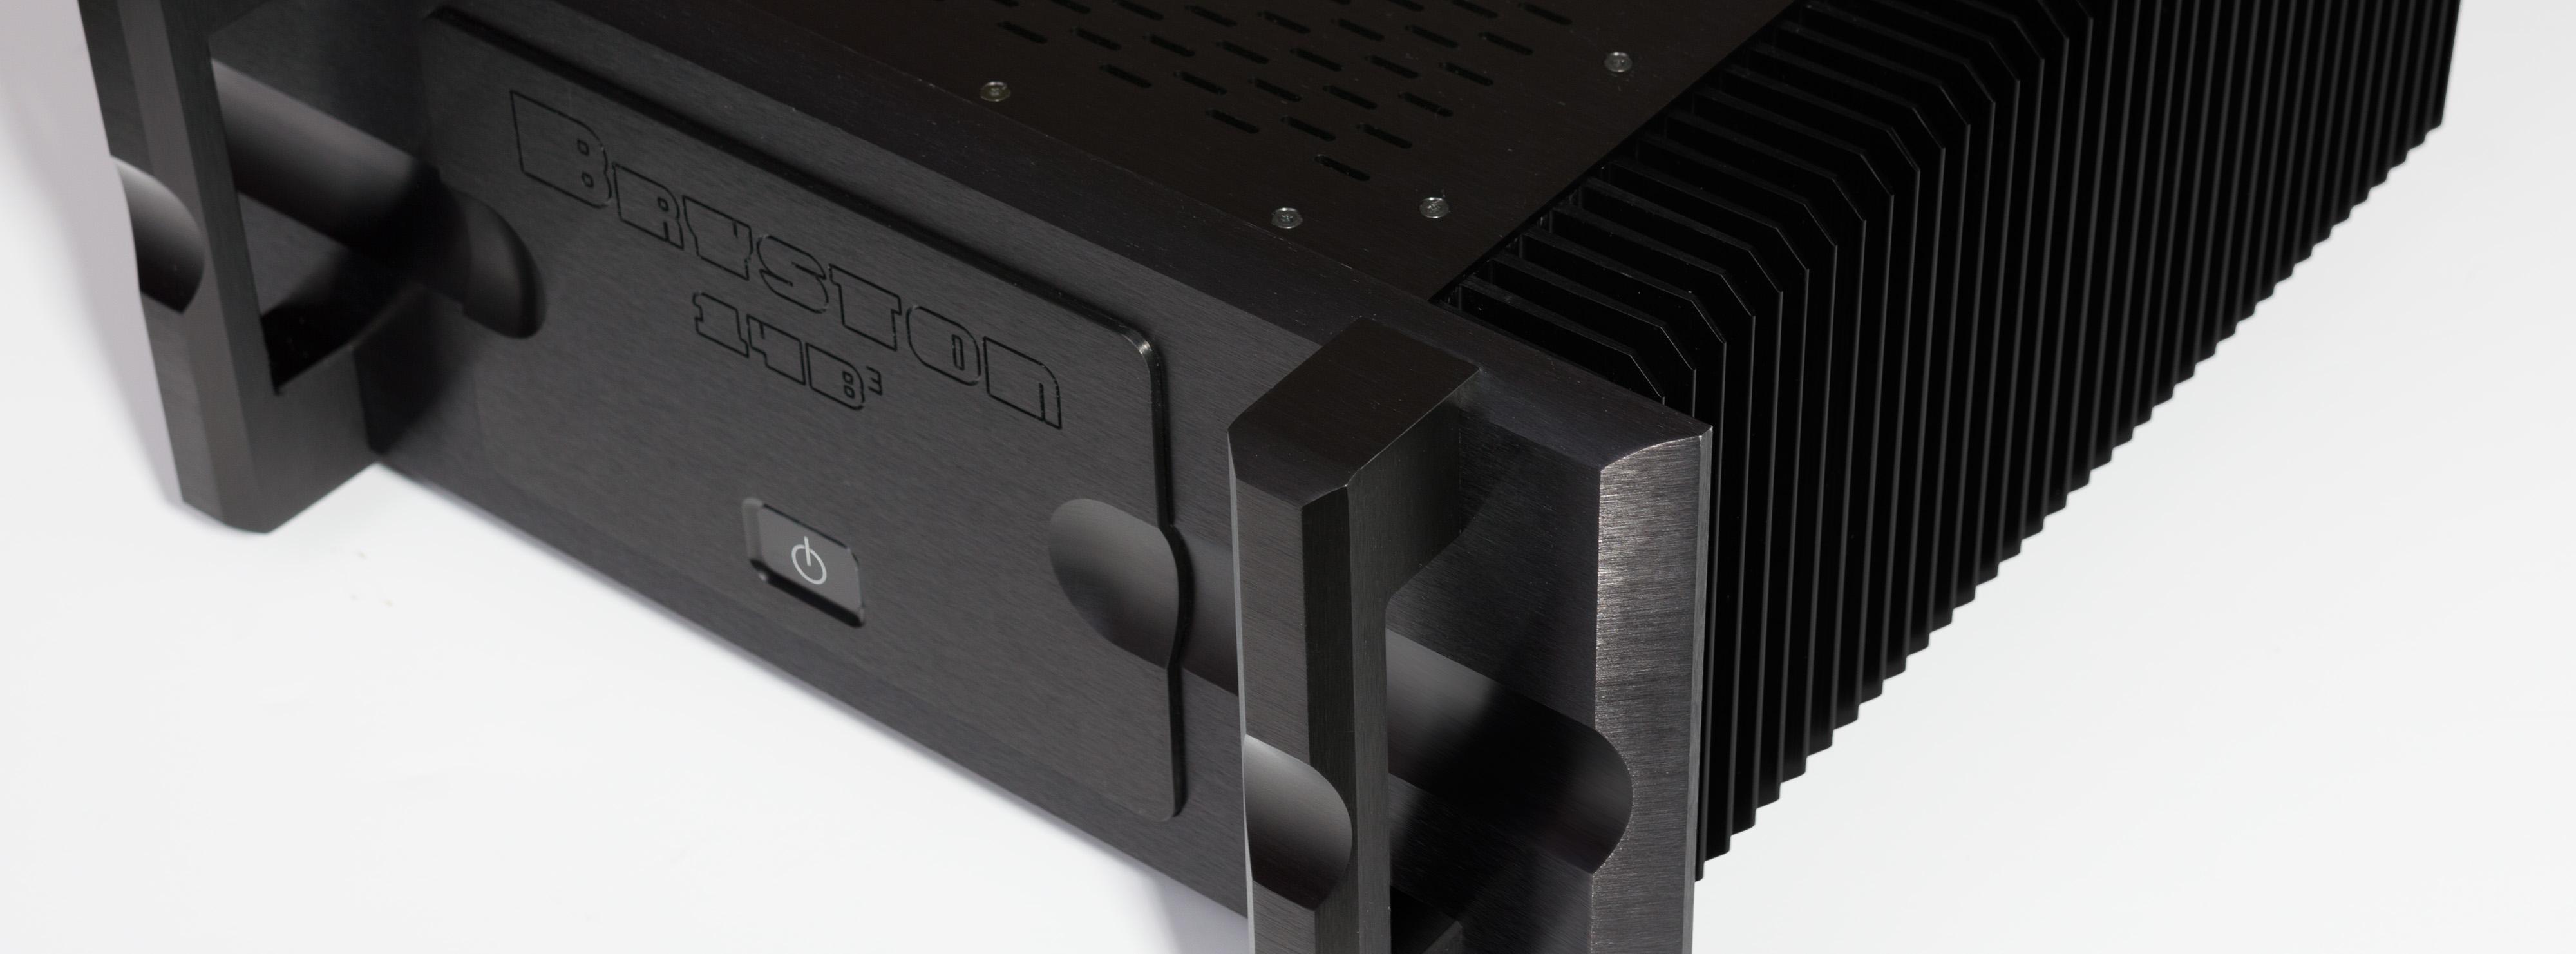 bryston-14b-power-audio-amplifier-black-angle-banner.jpg